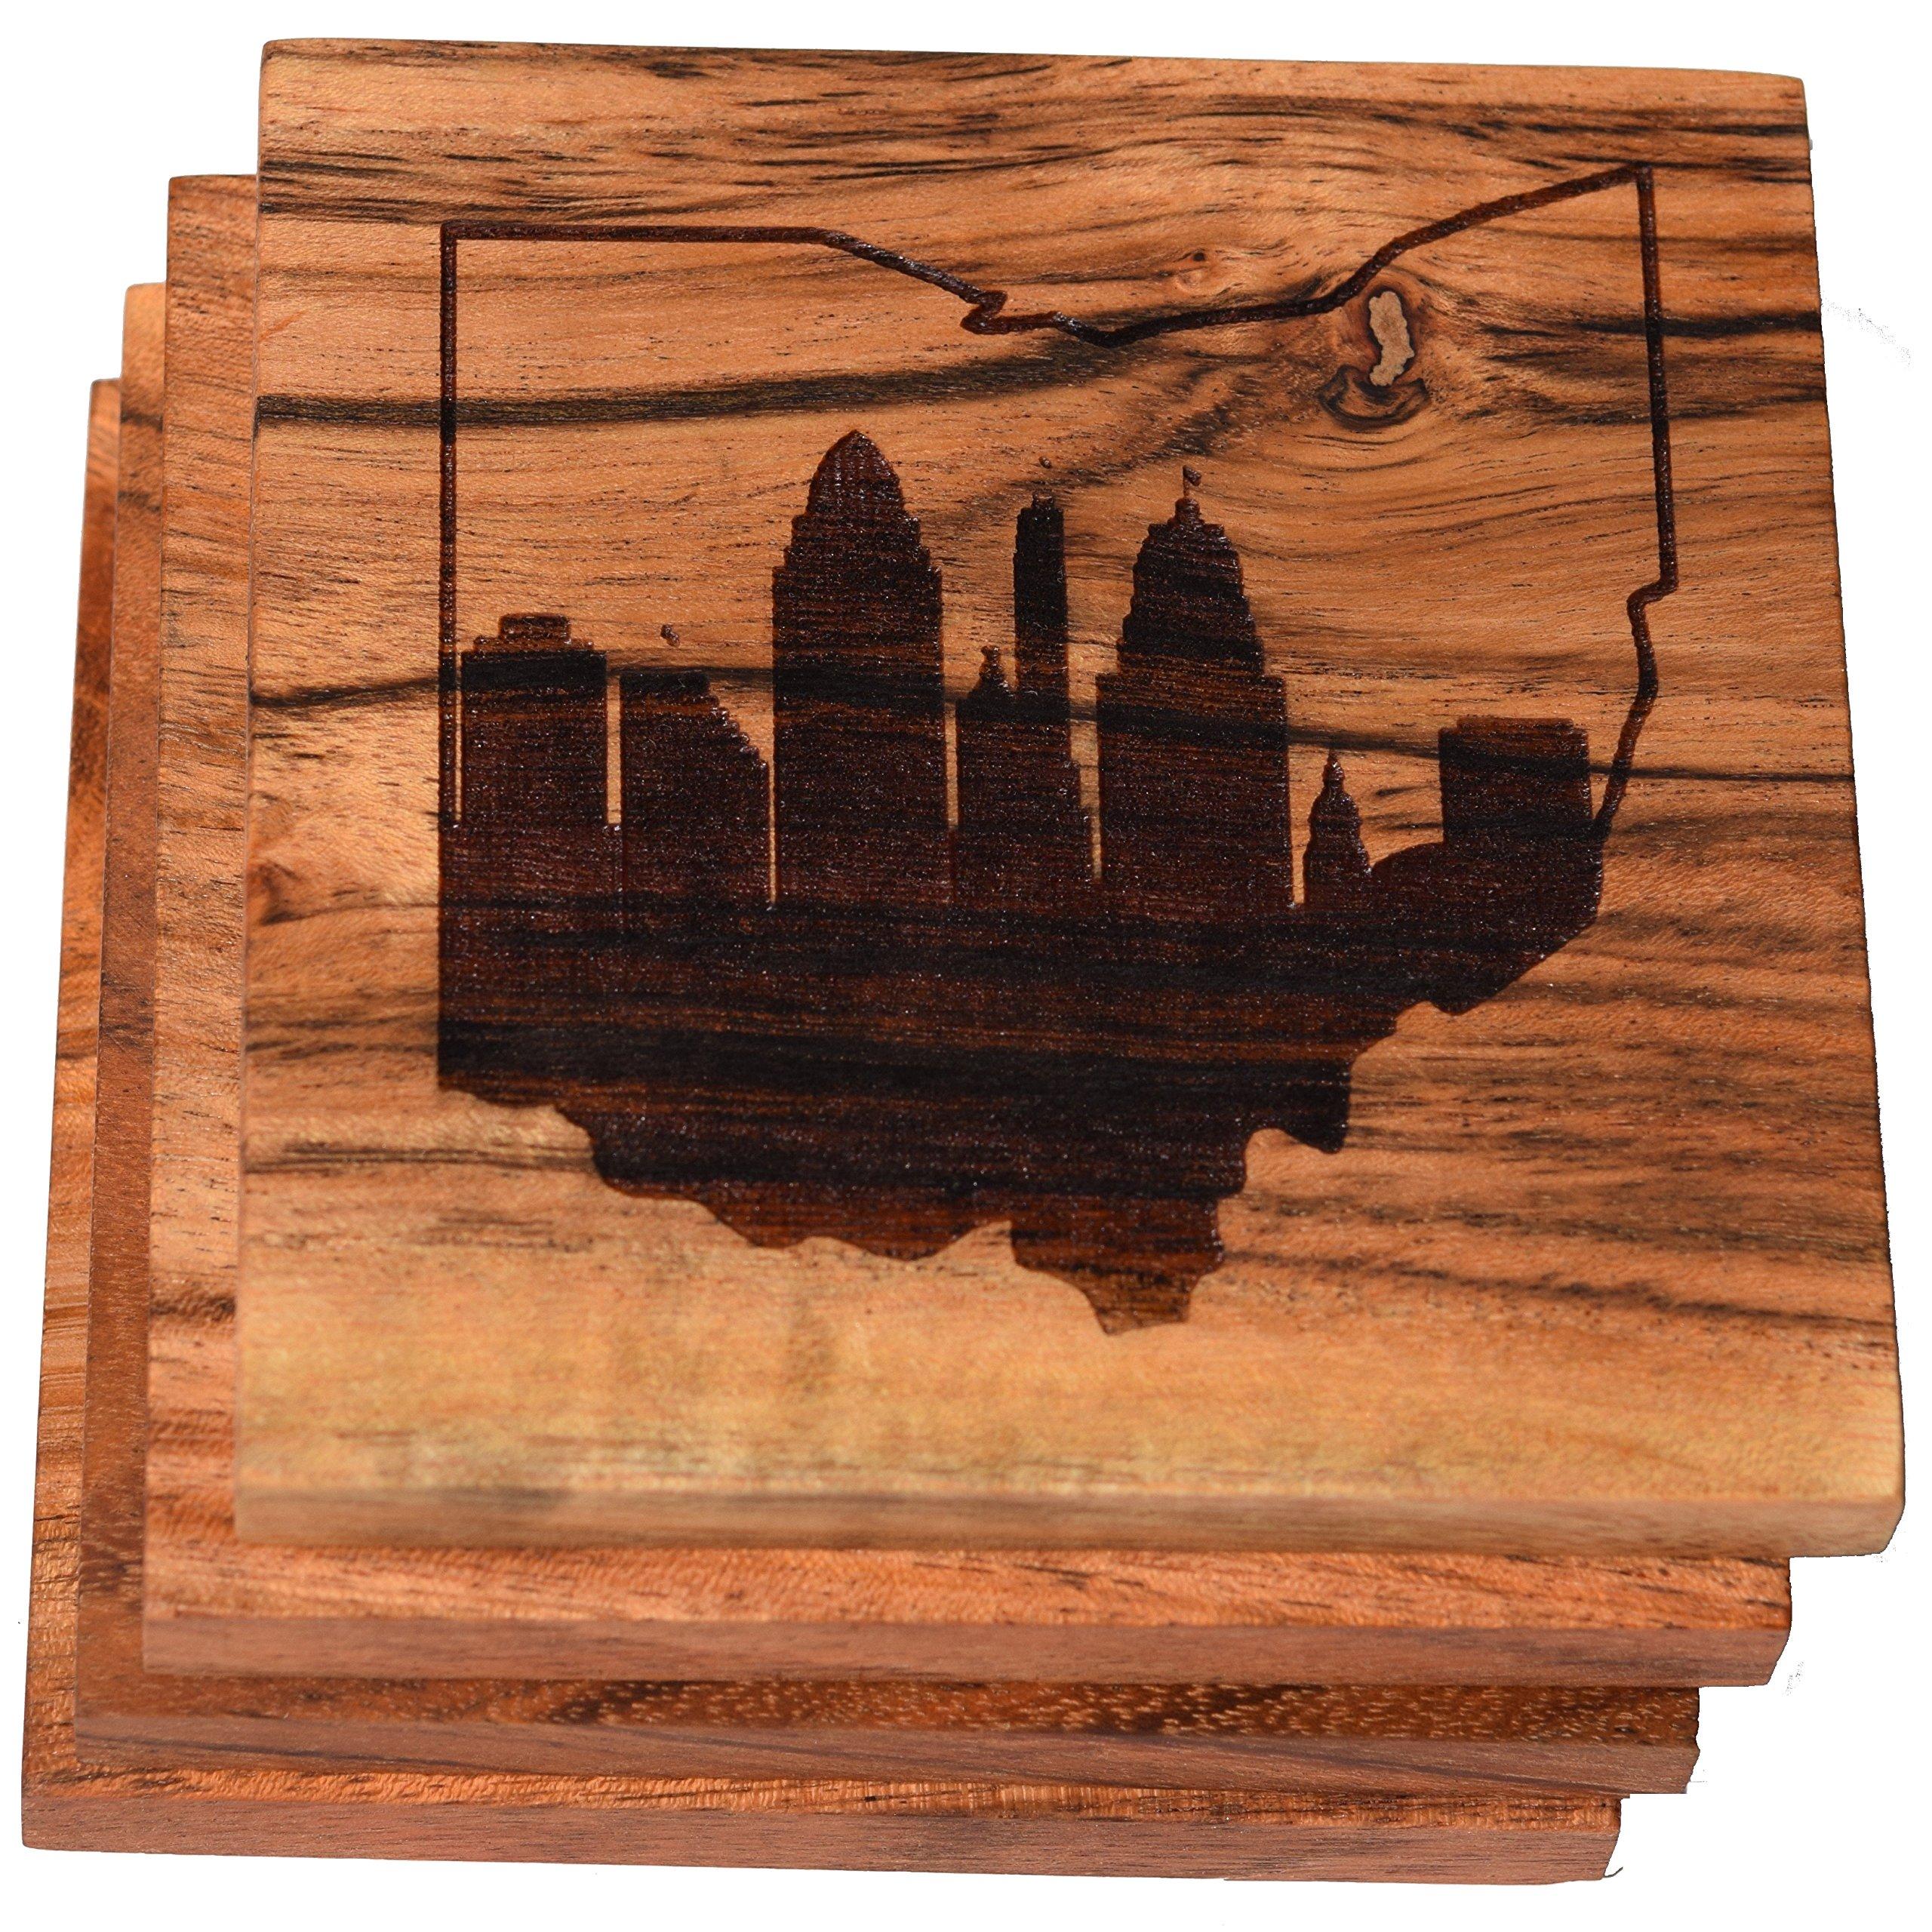 Cincinnati Skyline within Ohio Outline Coasters (Multiple Designs) - Engraved Acacia Wood Design - Set of Four